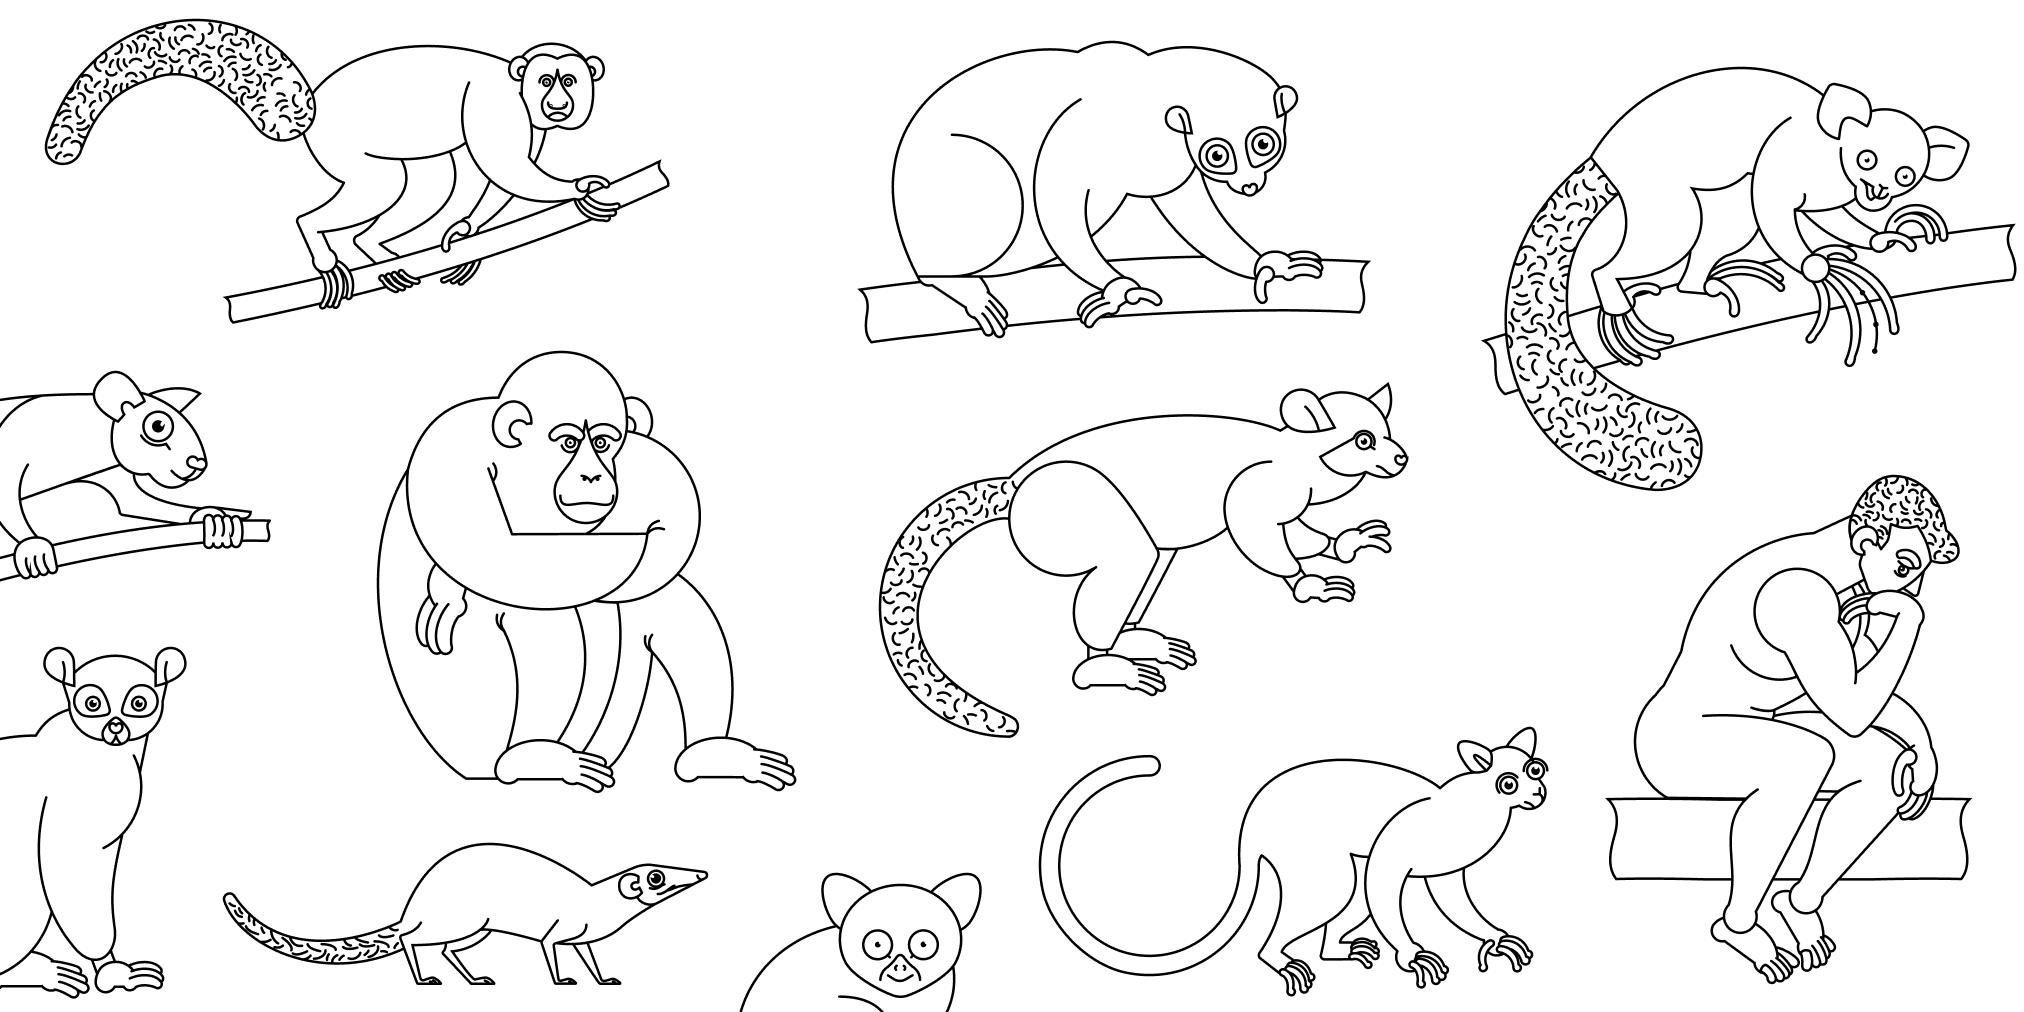 Primate tree visualization